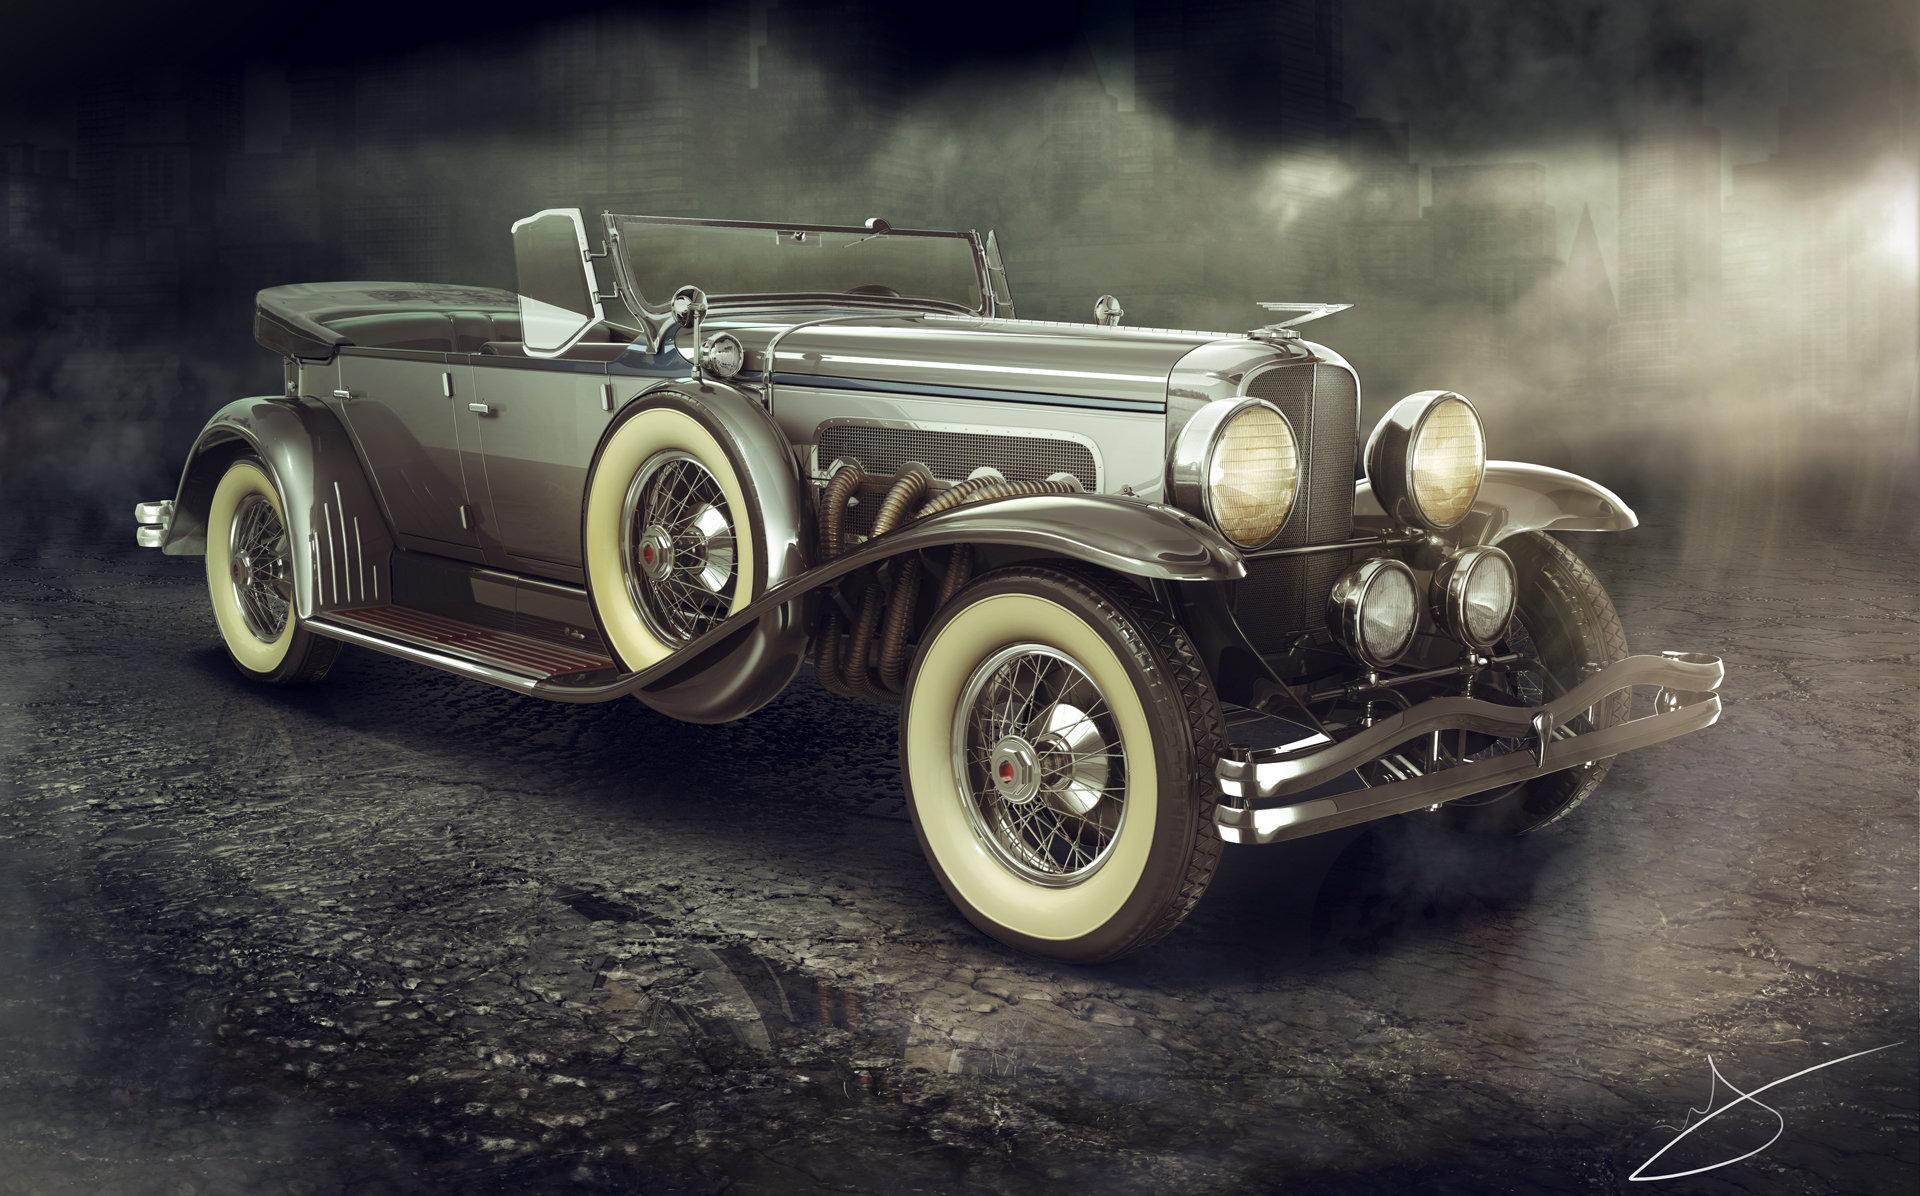 Alexandr novitskiy 1929 duesenberg model j dual cowl phaeton city 04